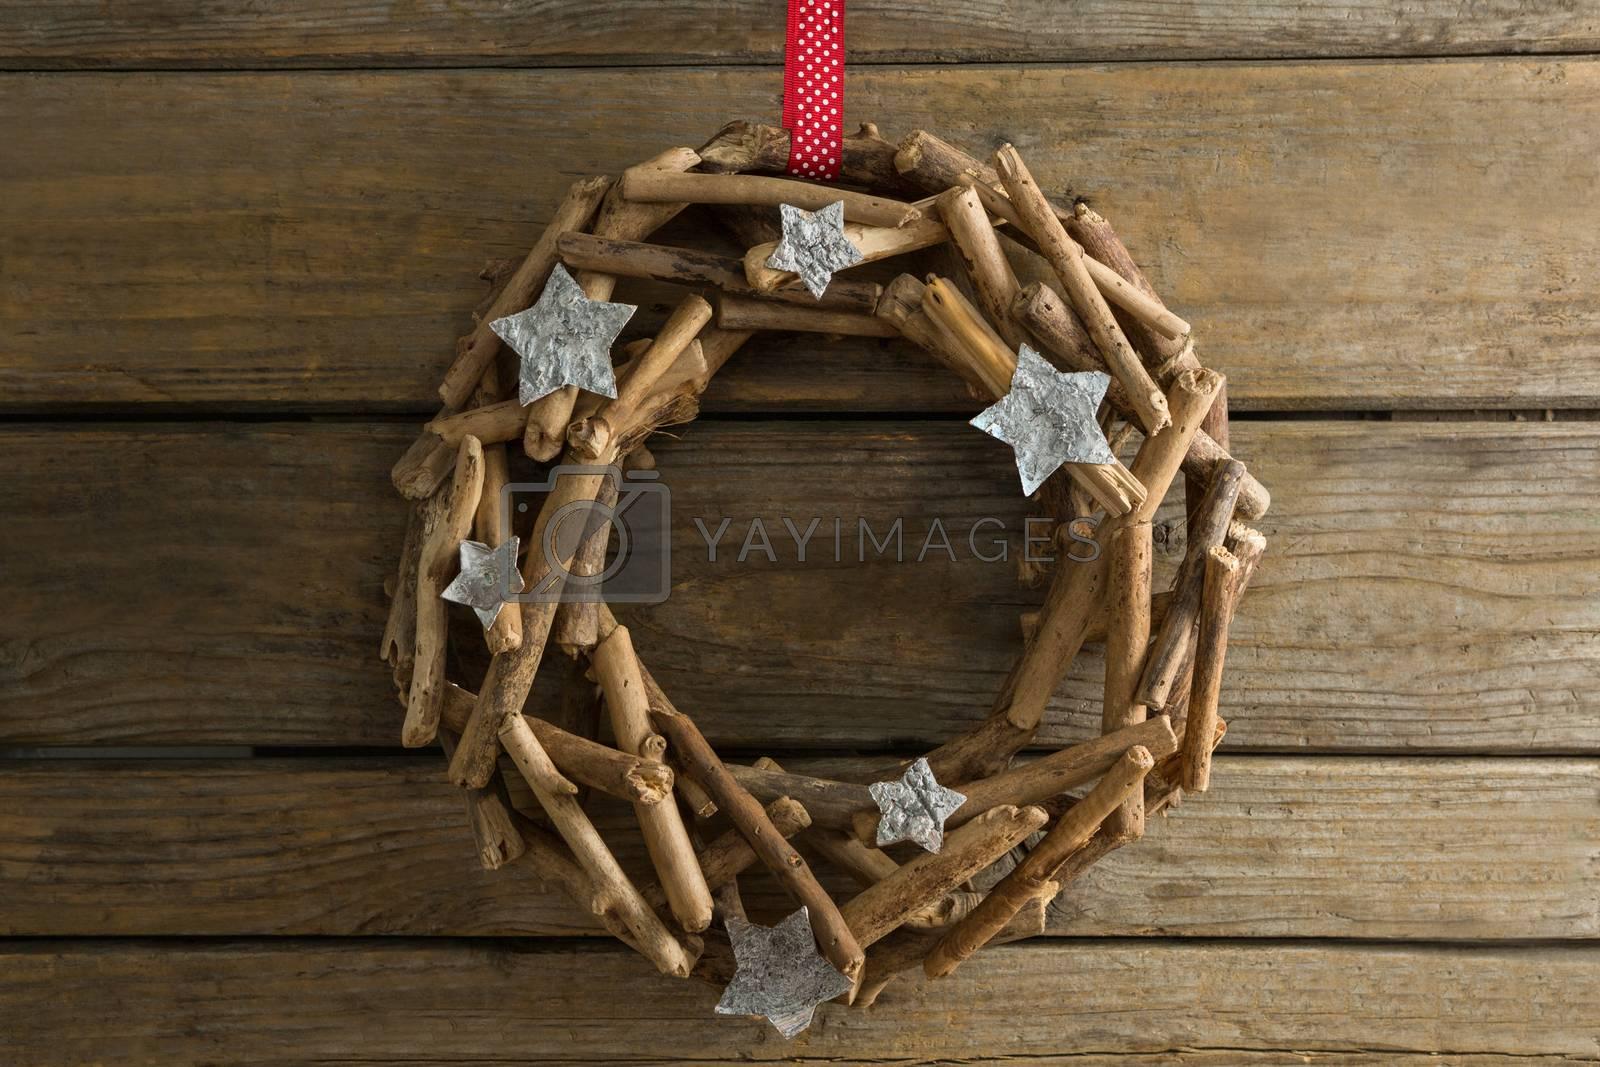 Overhead view of wooden wreath by Wavebreakmedia